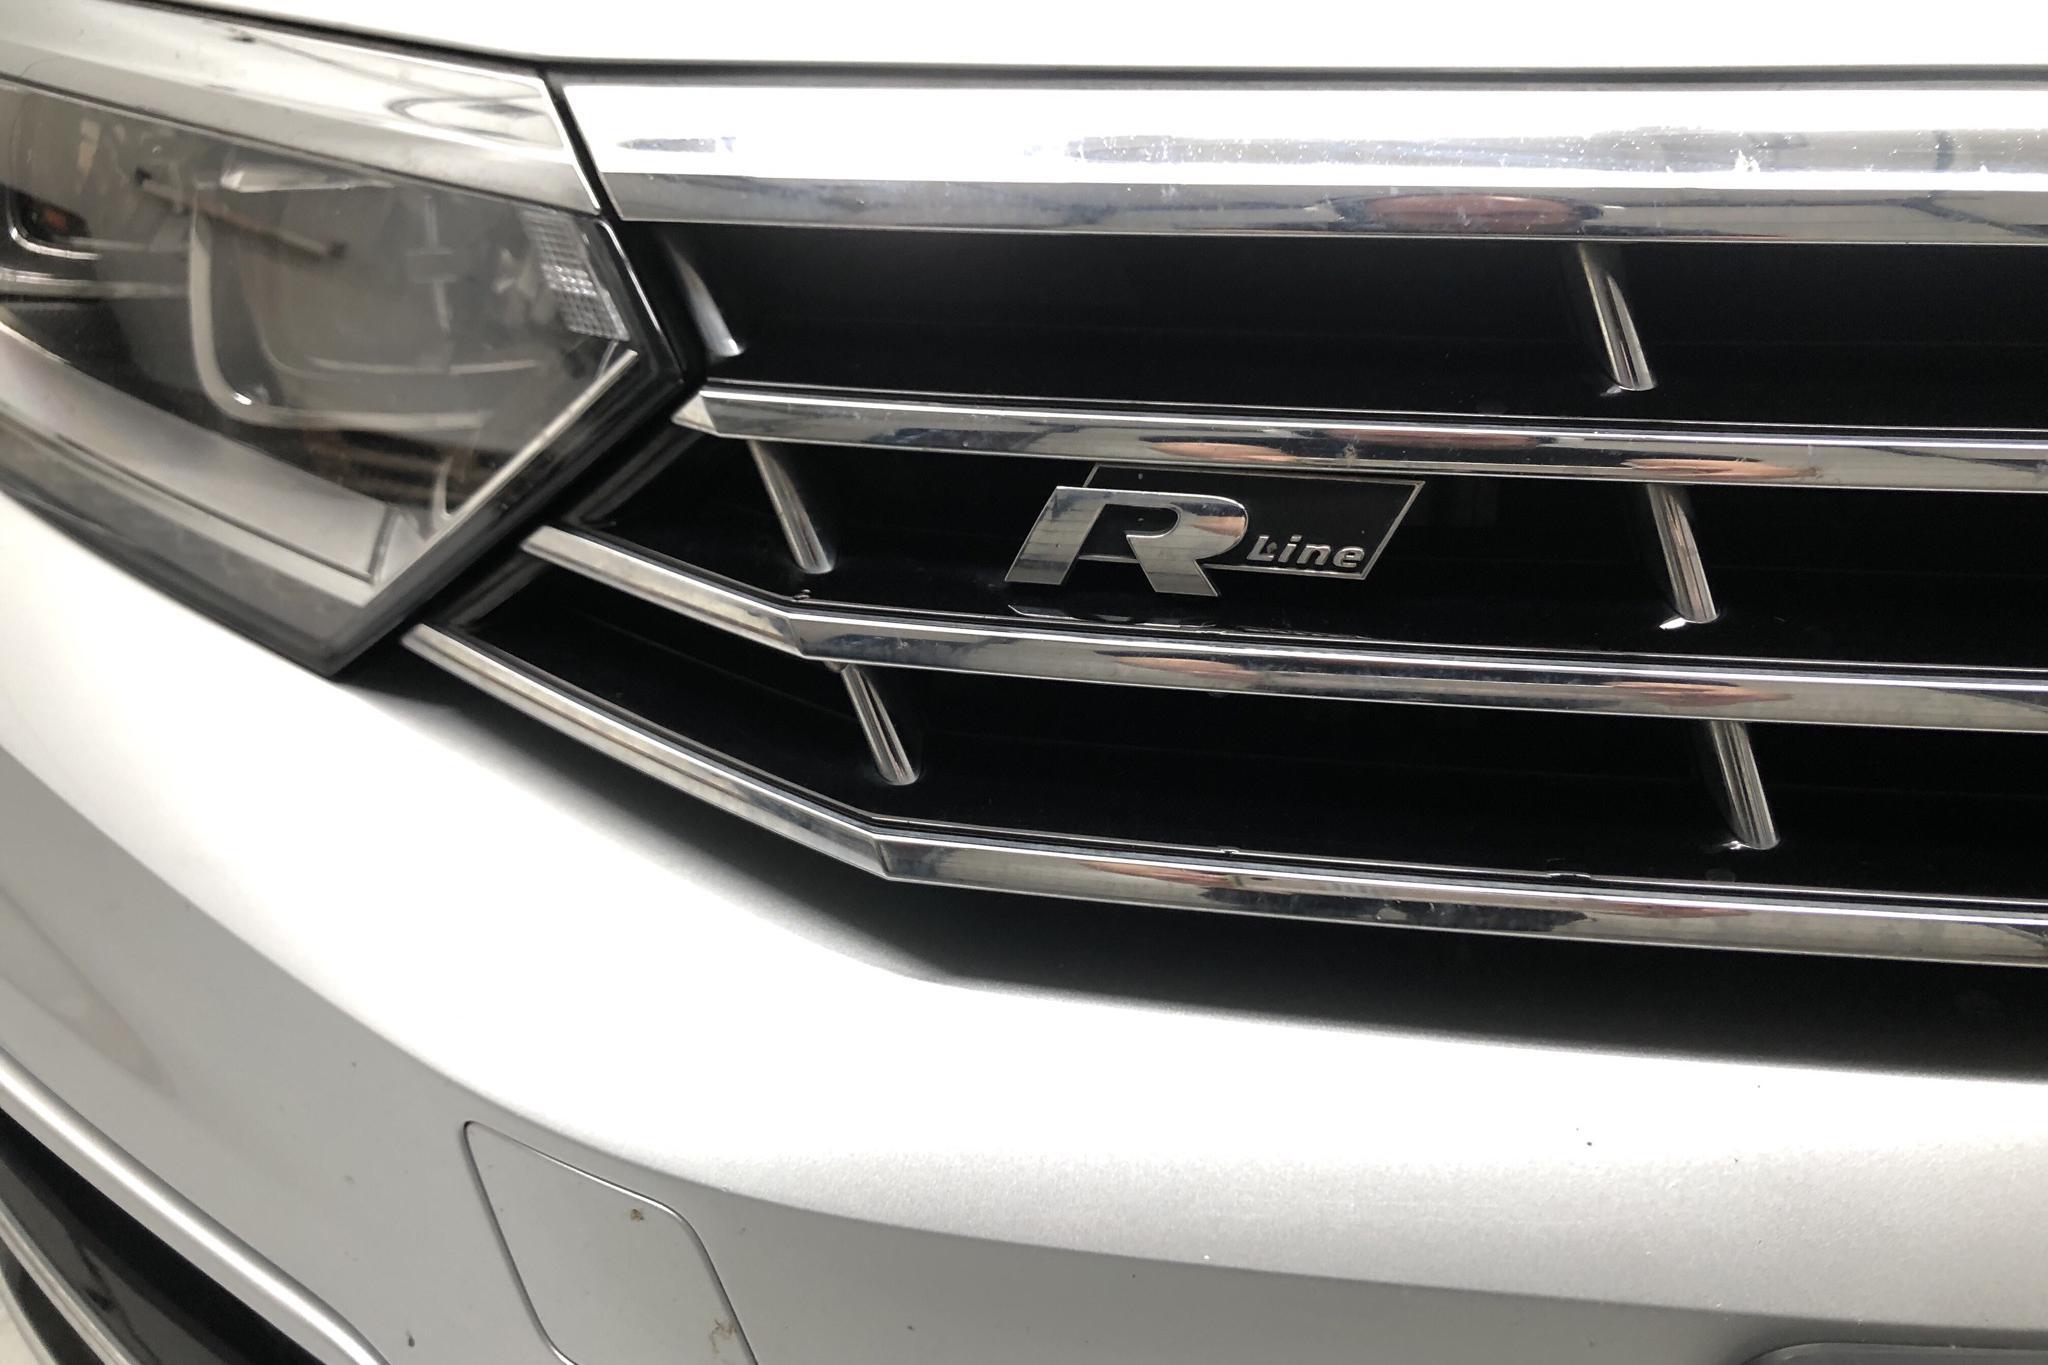 VW Passat 2.0 TDI 4MOTION (190hk) - 89 080 km - Automatic - silver - 2019